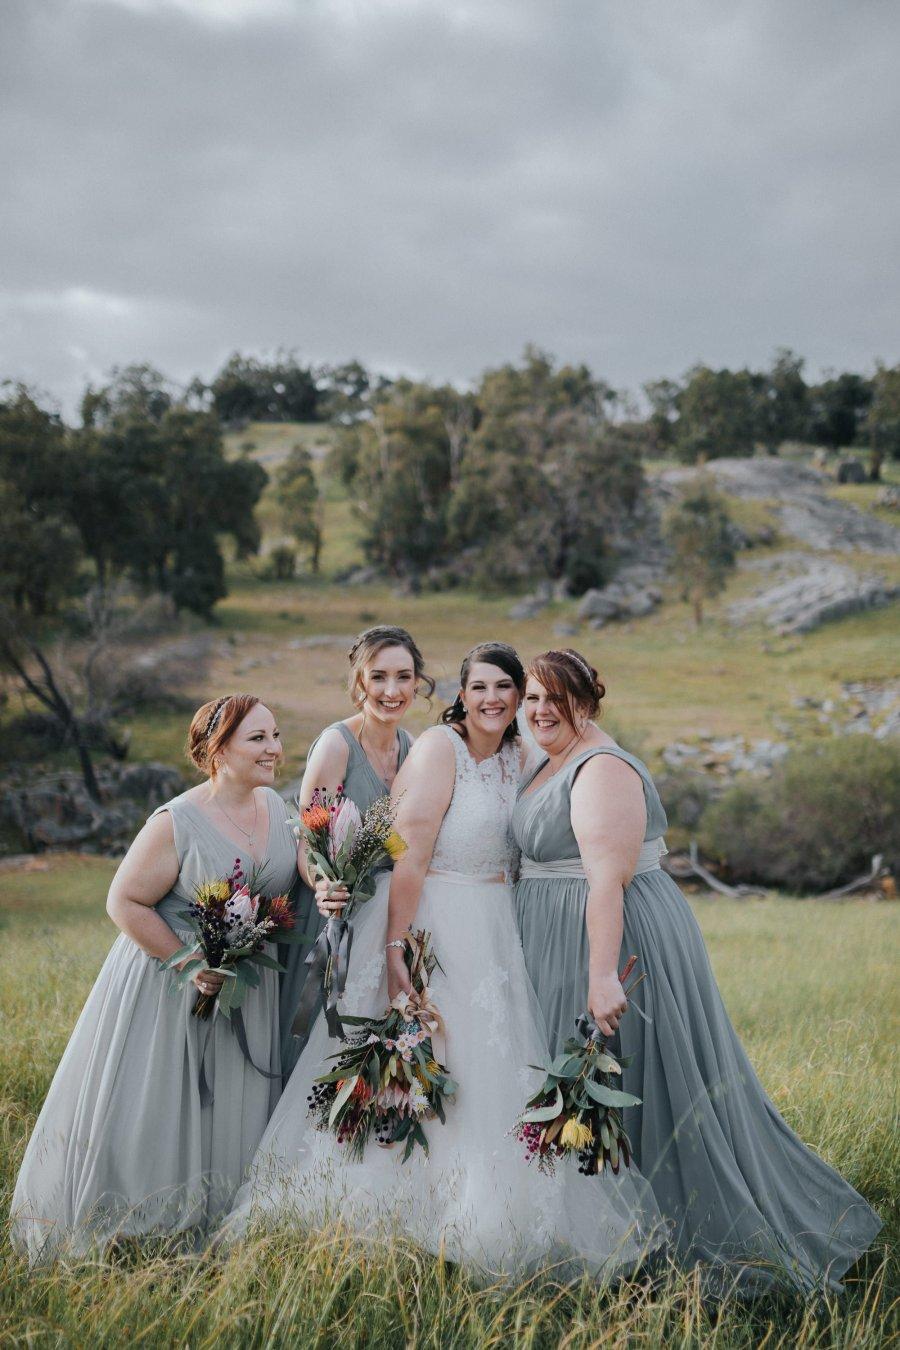 Perth Wedding Photographer | Wedding Photographers Perth | Bells Rapids Wedding | Zoe Theaidore Photography | Ebony Blush Photography | M+K198